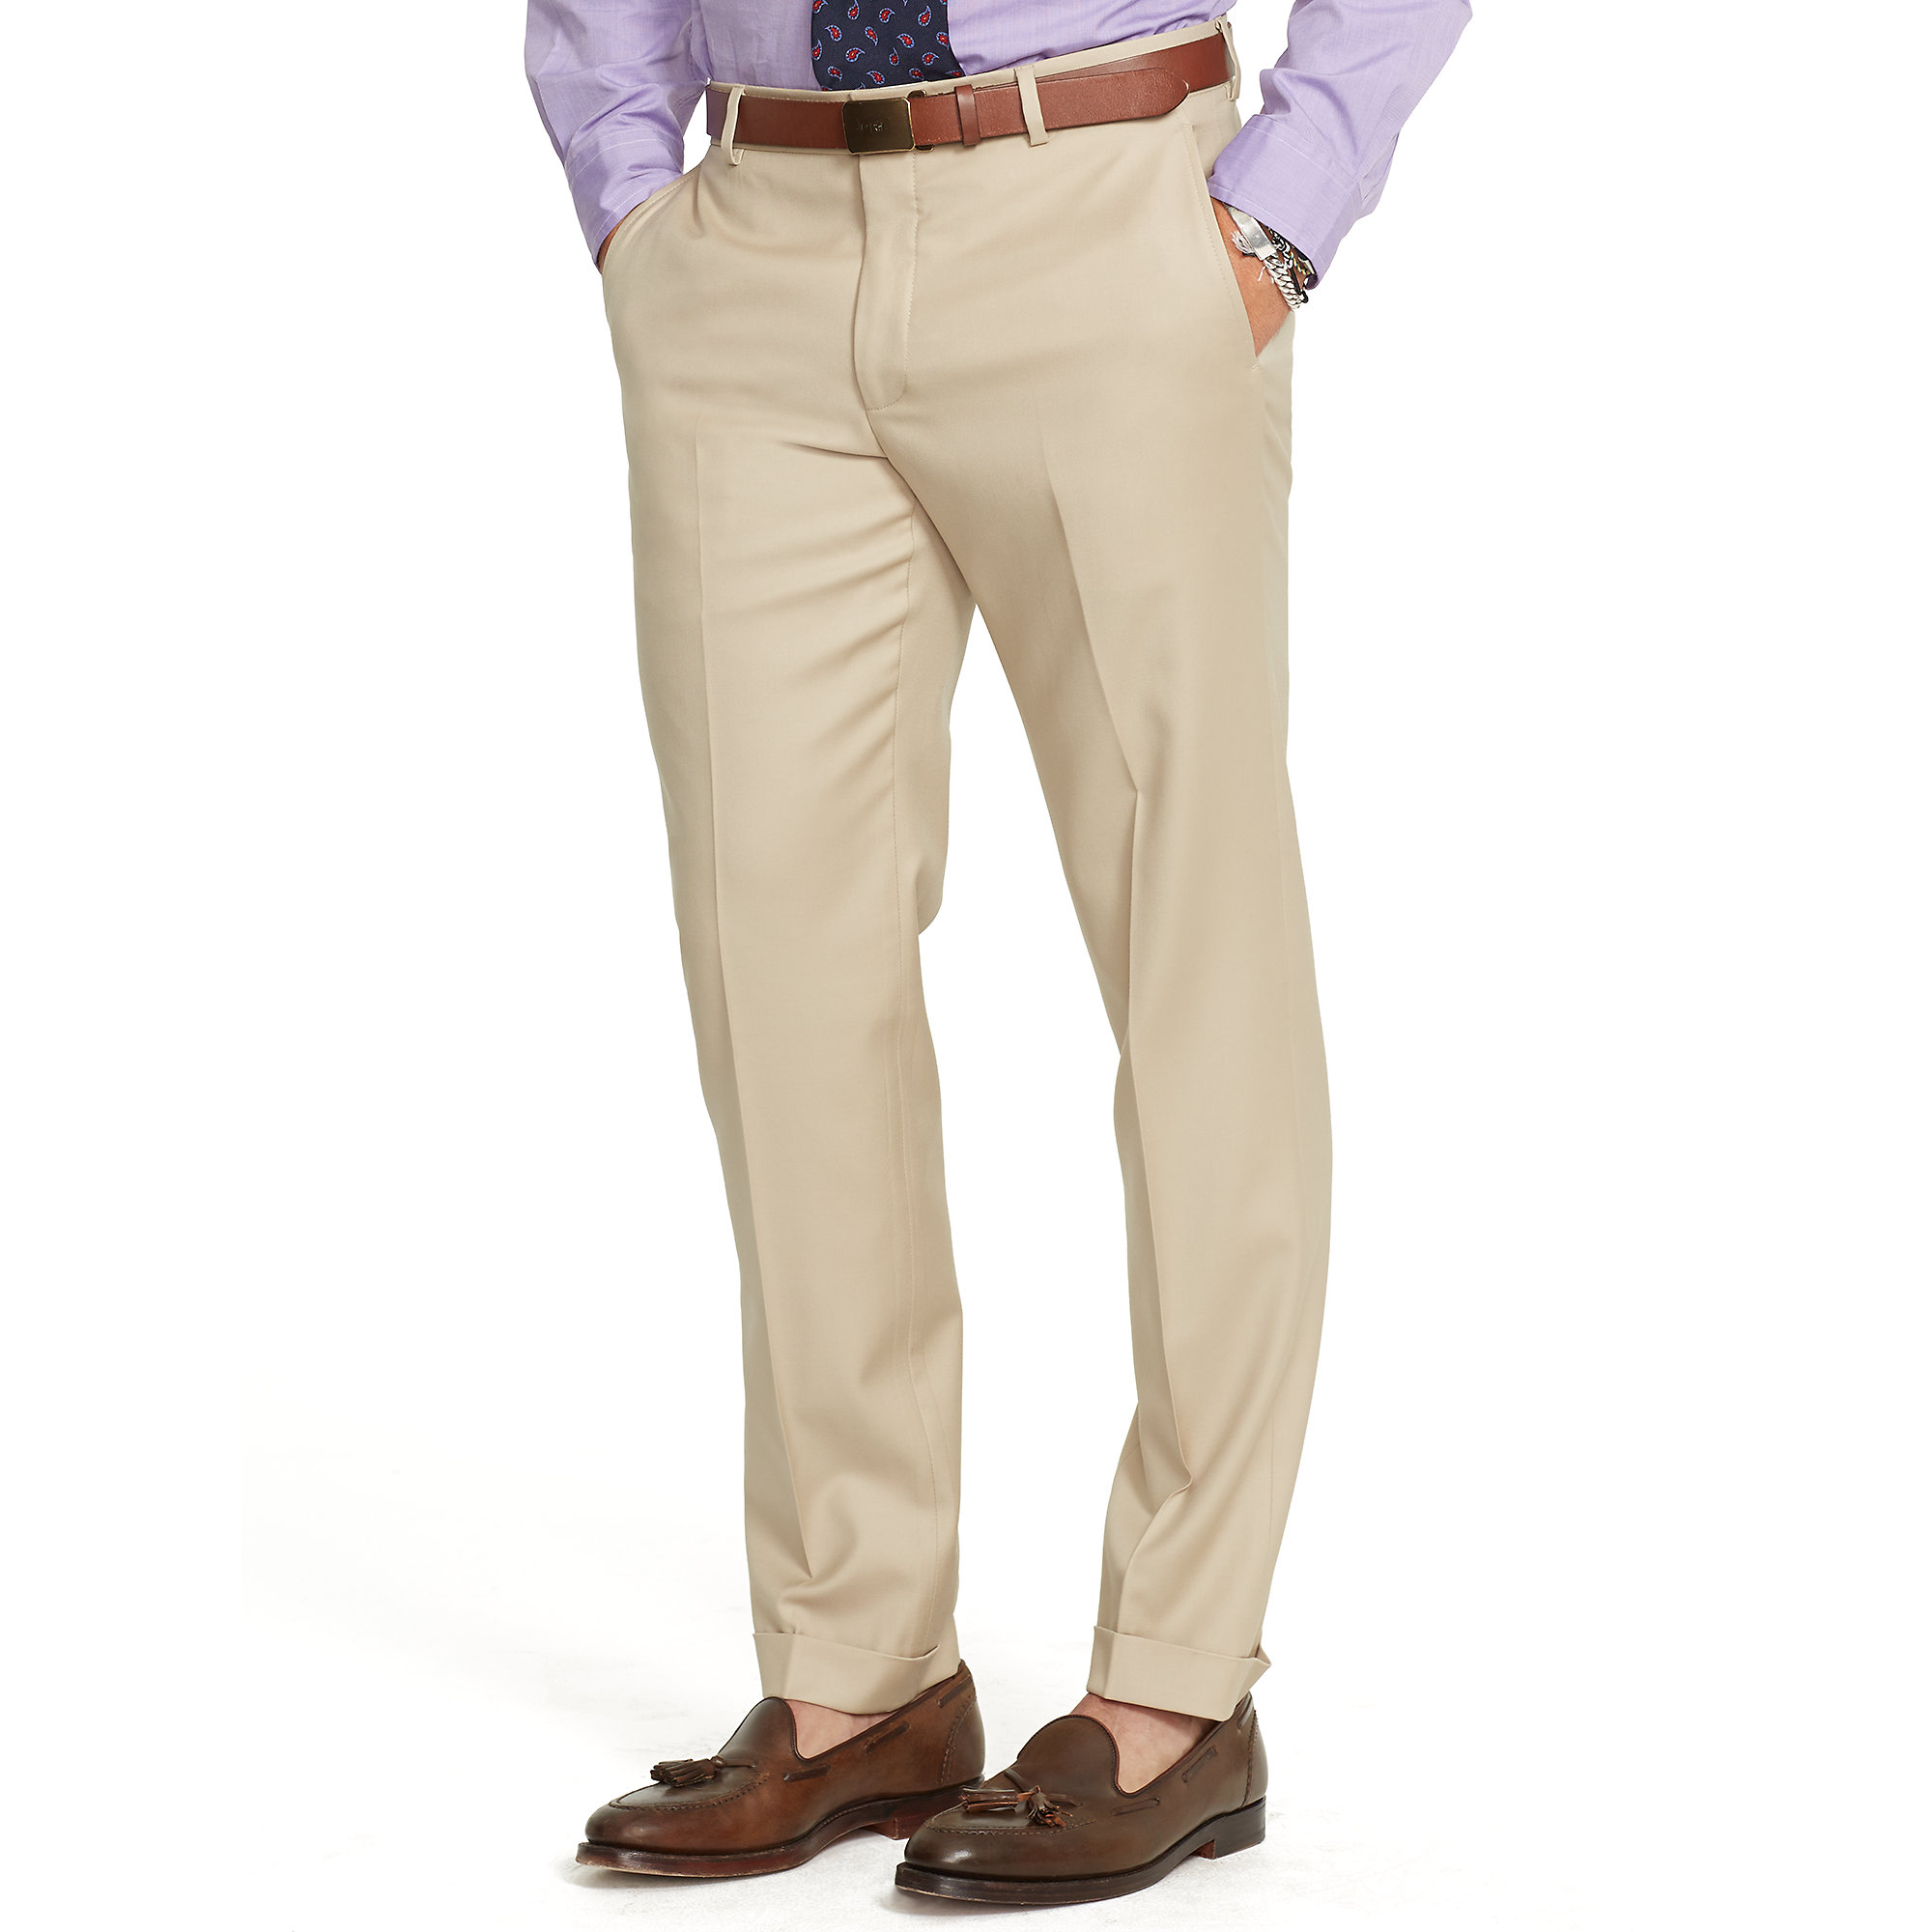 ralph lauren brown slim fit wool twill trouser for men. Black Bedroom Furniture Sets. Home Design Ideas